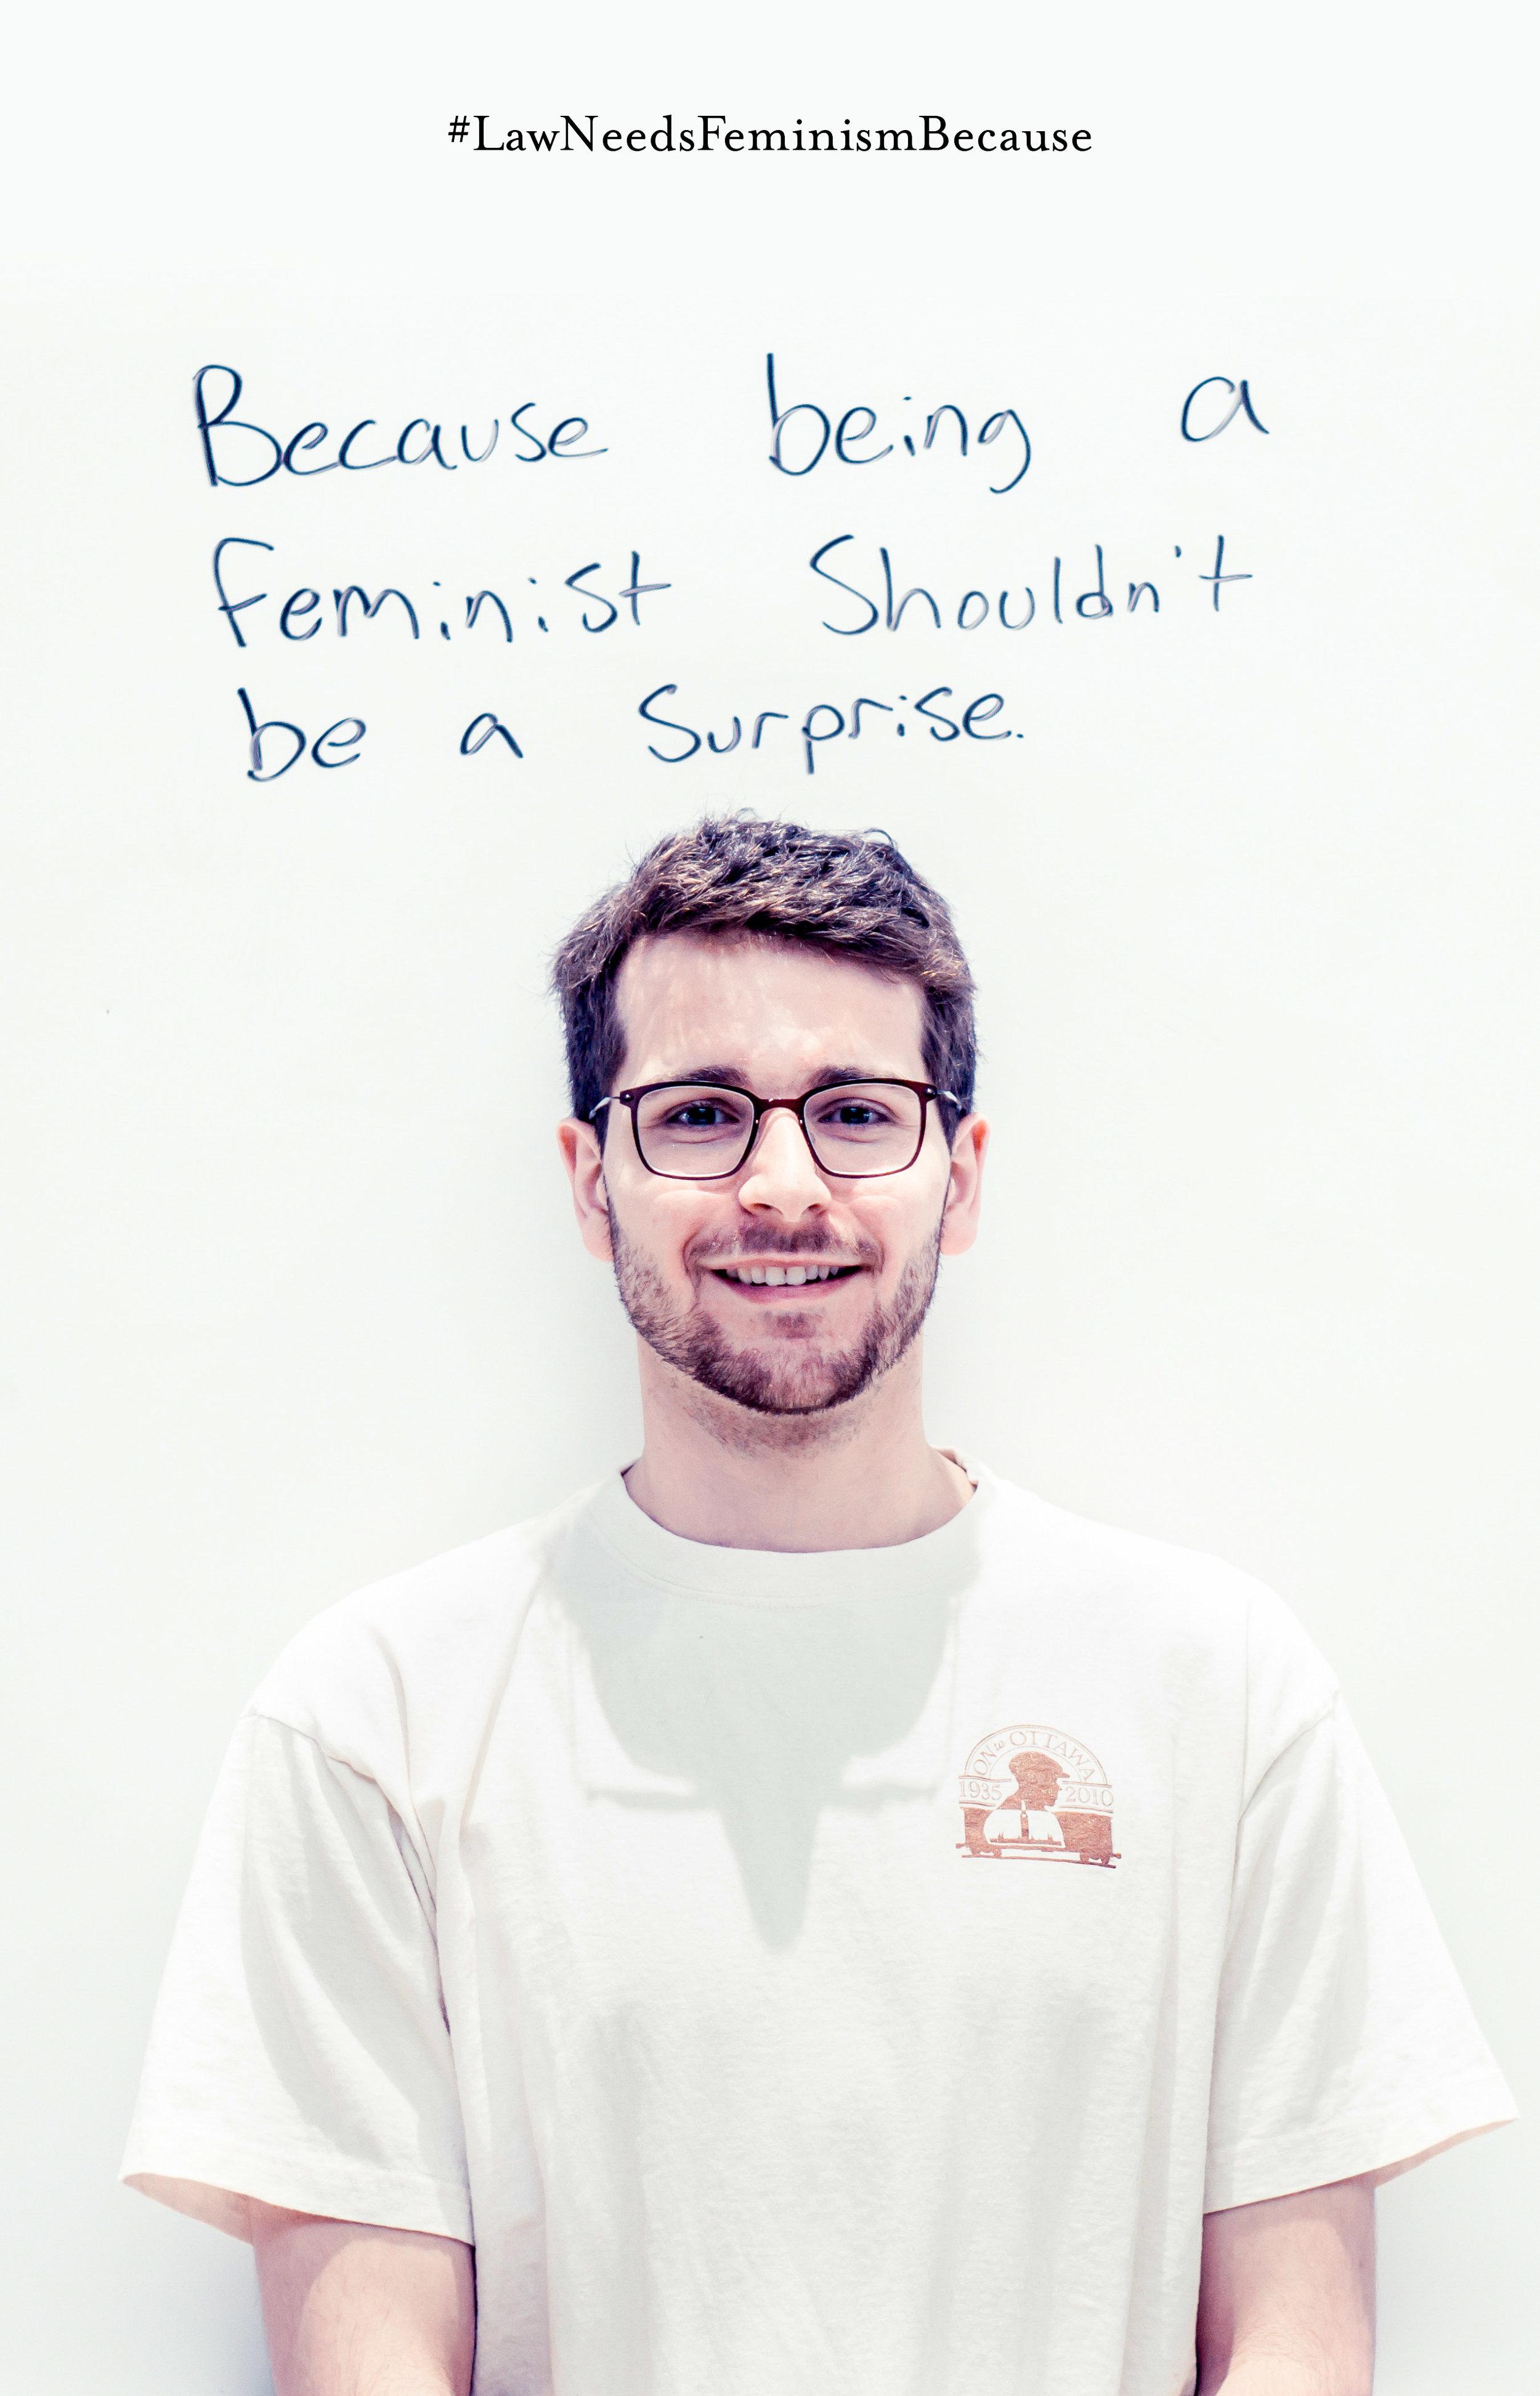 #LawNeedsFeminismBecause-3.jpg